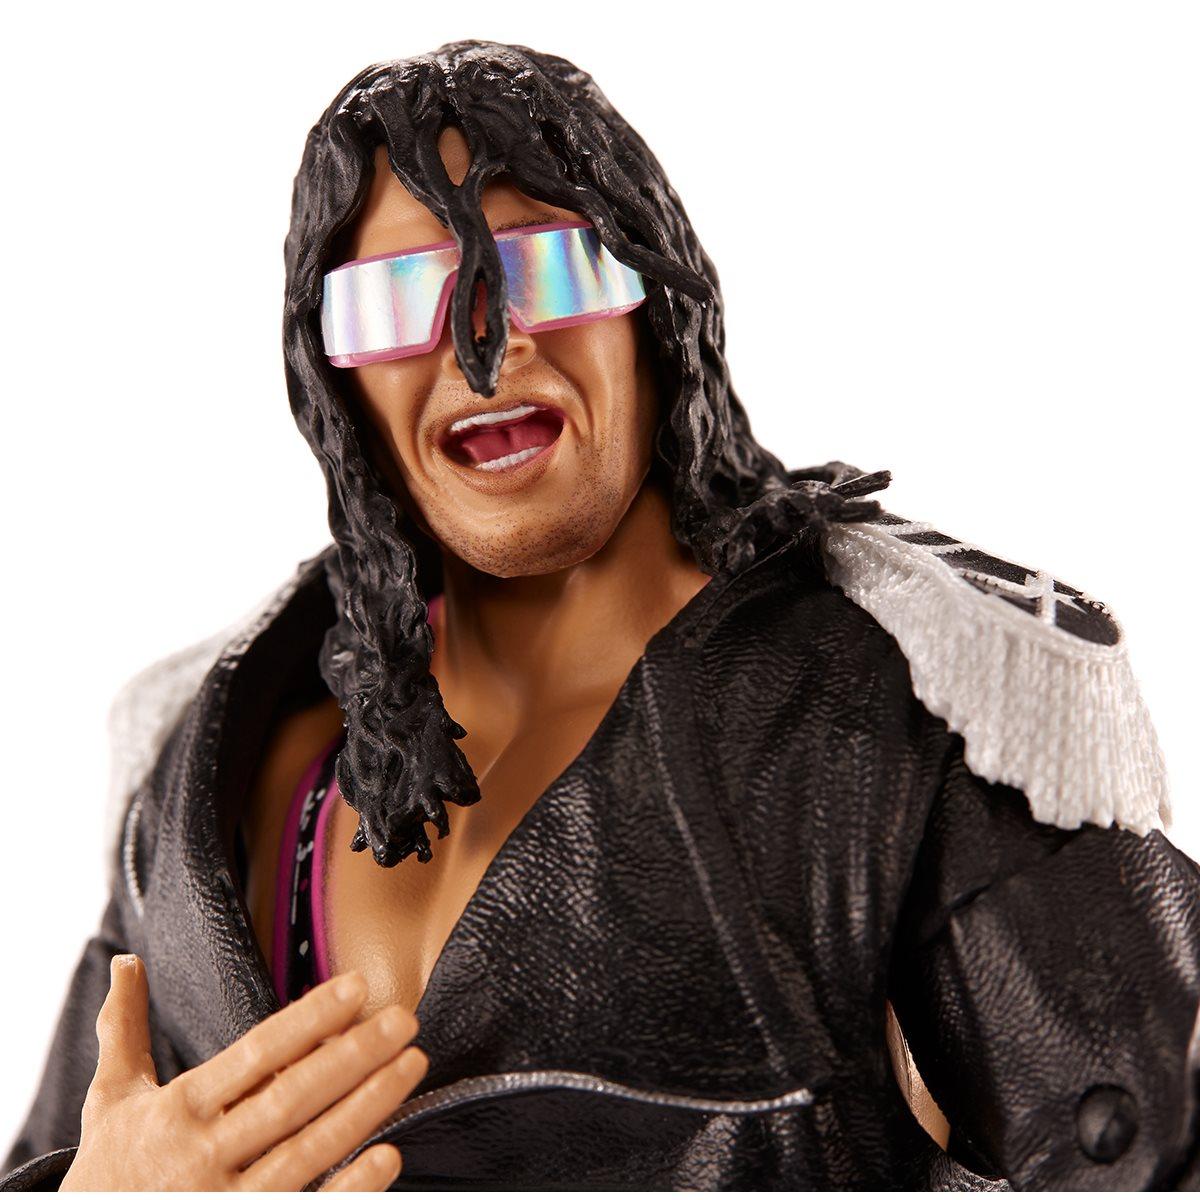 Wwe Ultimate Edition Bret Hitman Hart Action Figure Entertainment Earth